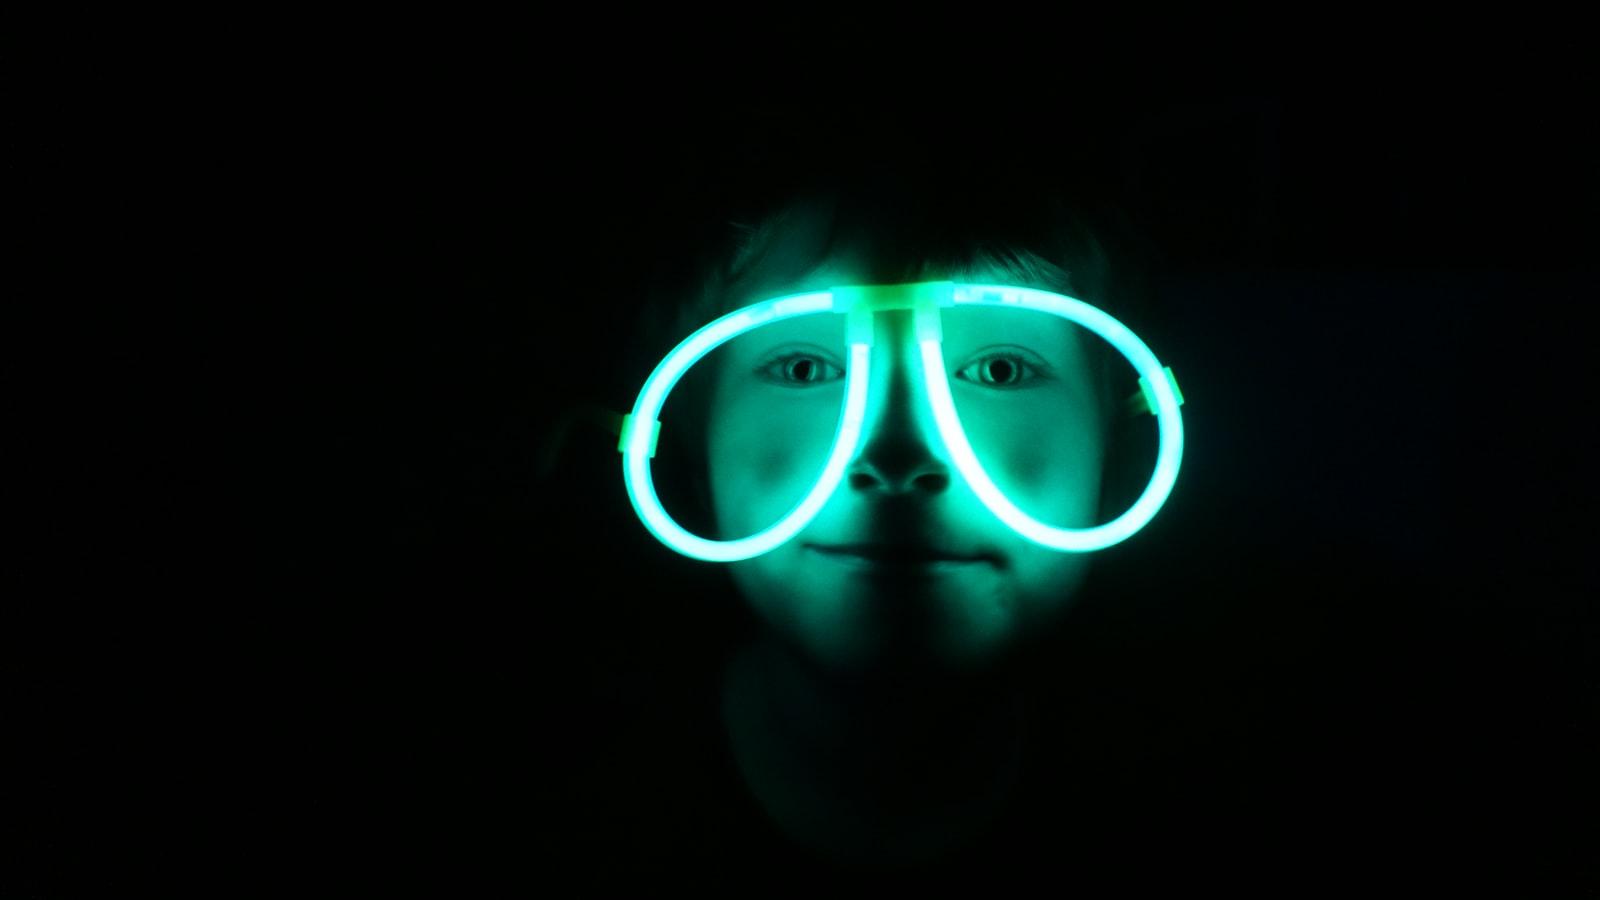 COLOR BLINDNESS CORRECTION GLASSES